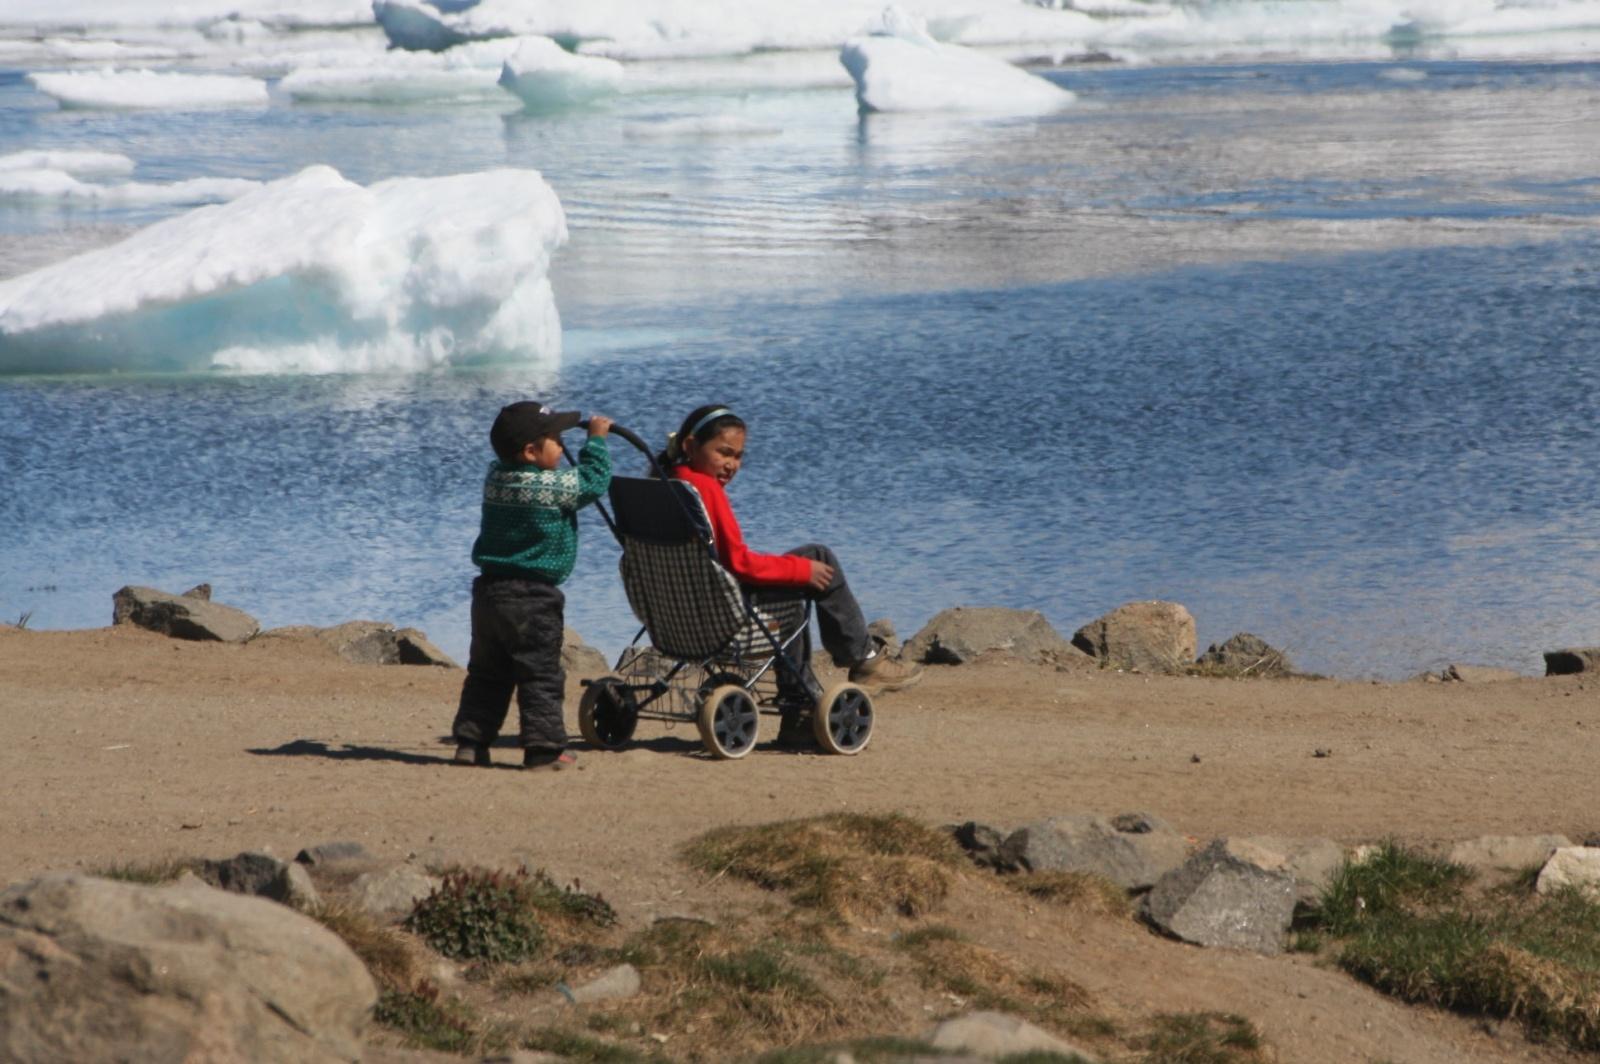 Children and ice